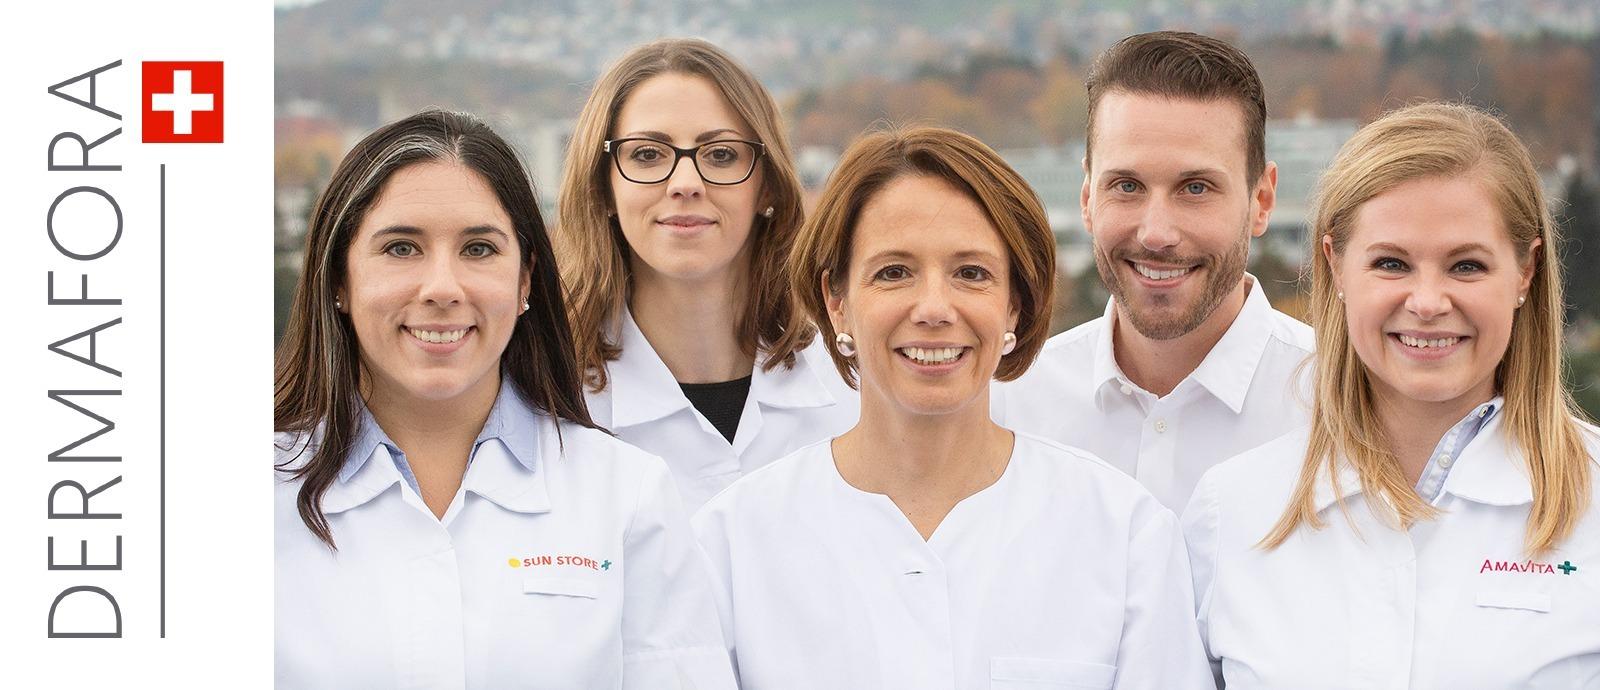 L'équipe de pharmaciens suisses de Dermafora